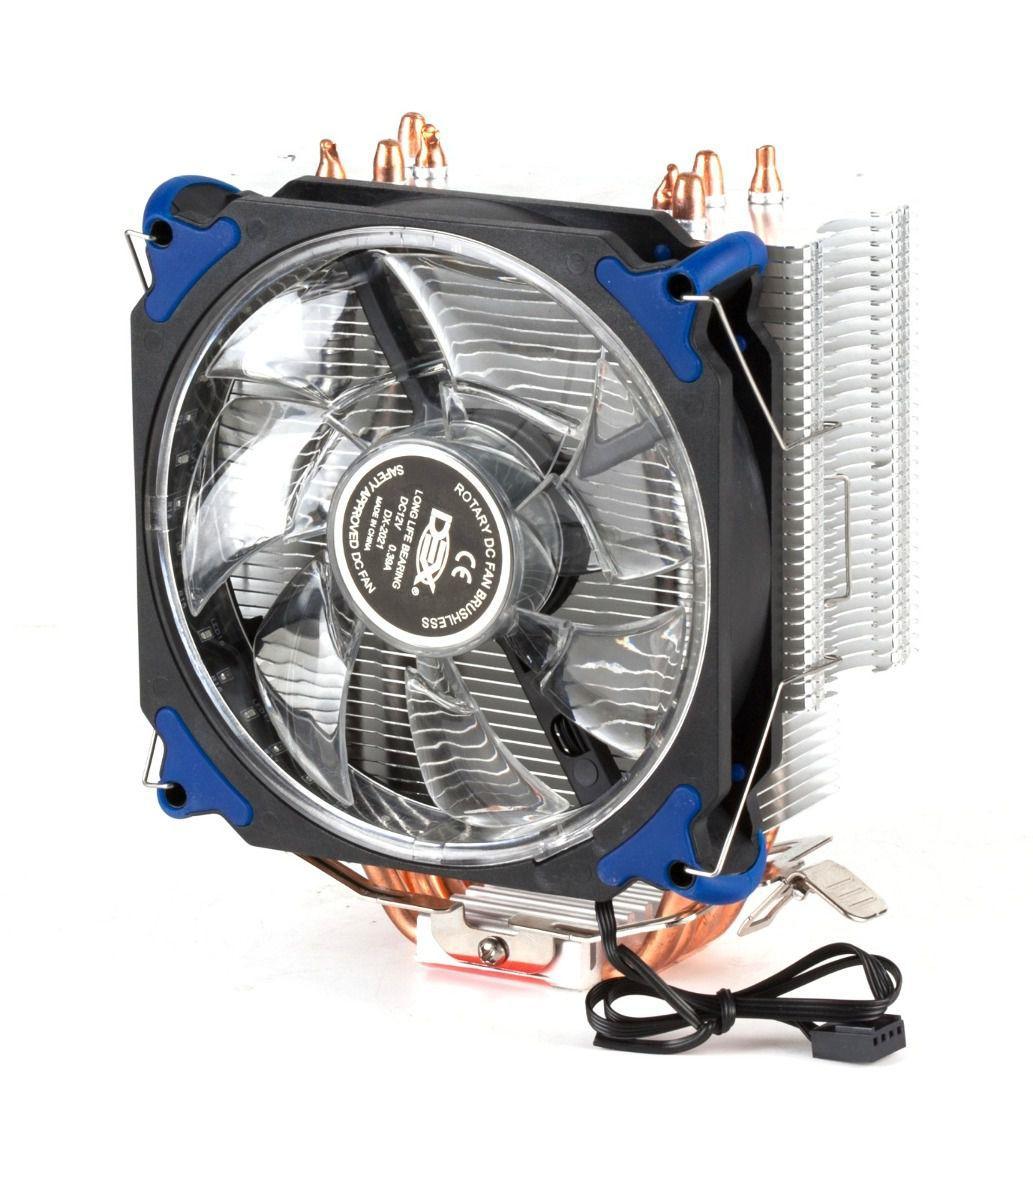 Cooler Para Cpu Universal Com 21 Leds Azul Dx-2021 socket 1366/ 1150/ 1156/ 775 - AMD: FM2+/ FM2/ FM1/ AM3+/ AM3/ AM2+/